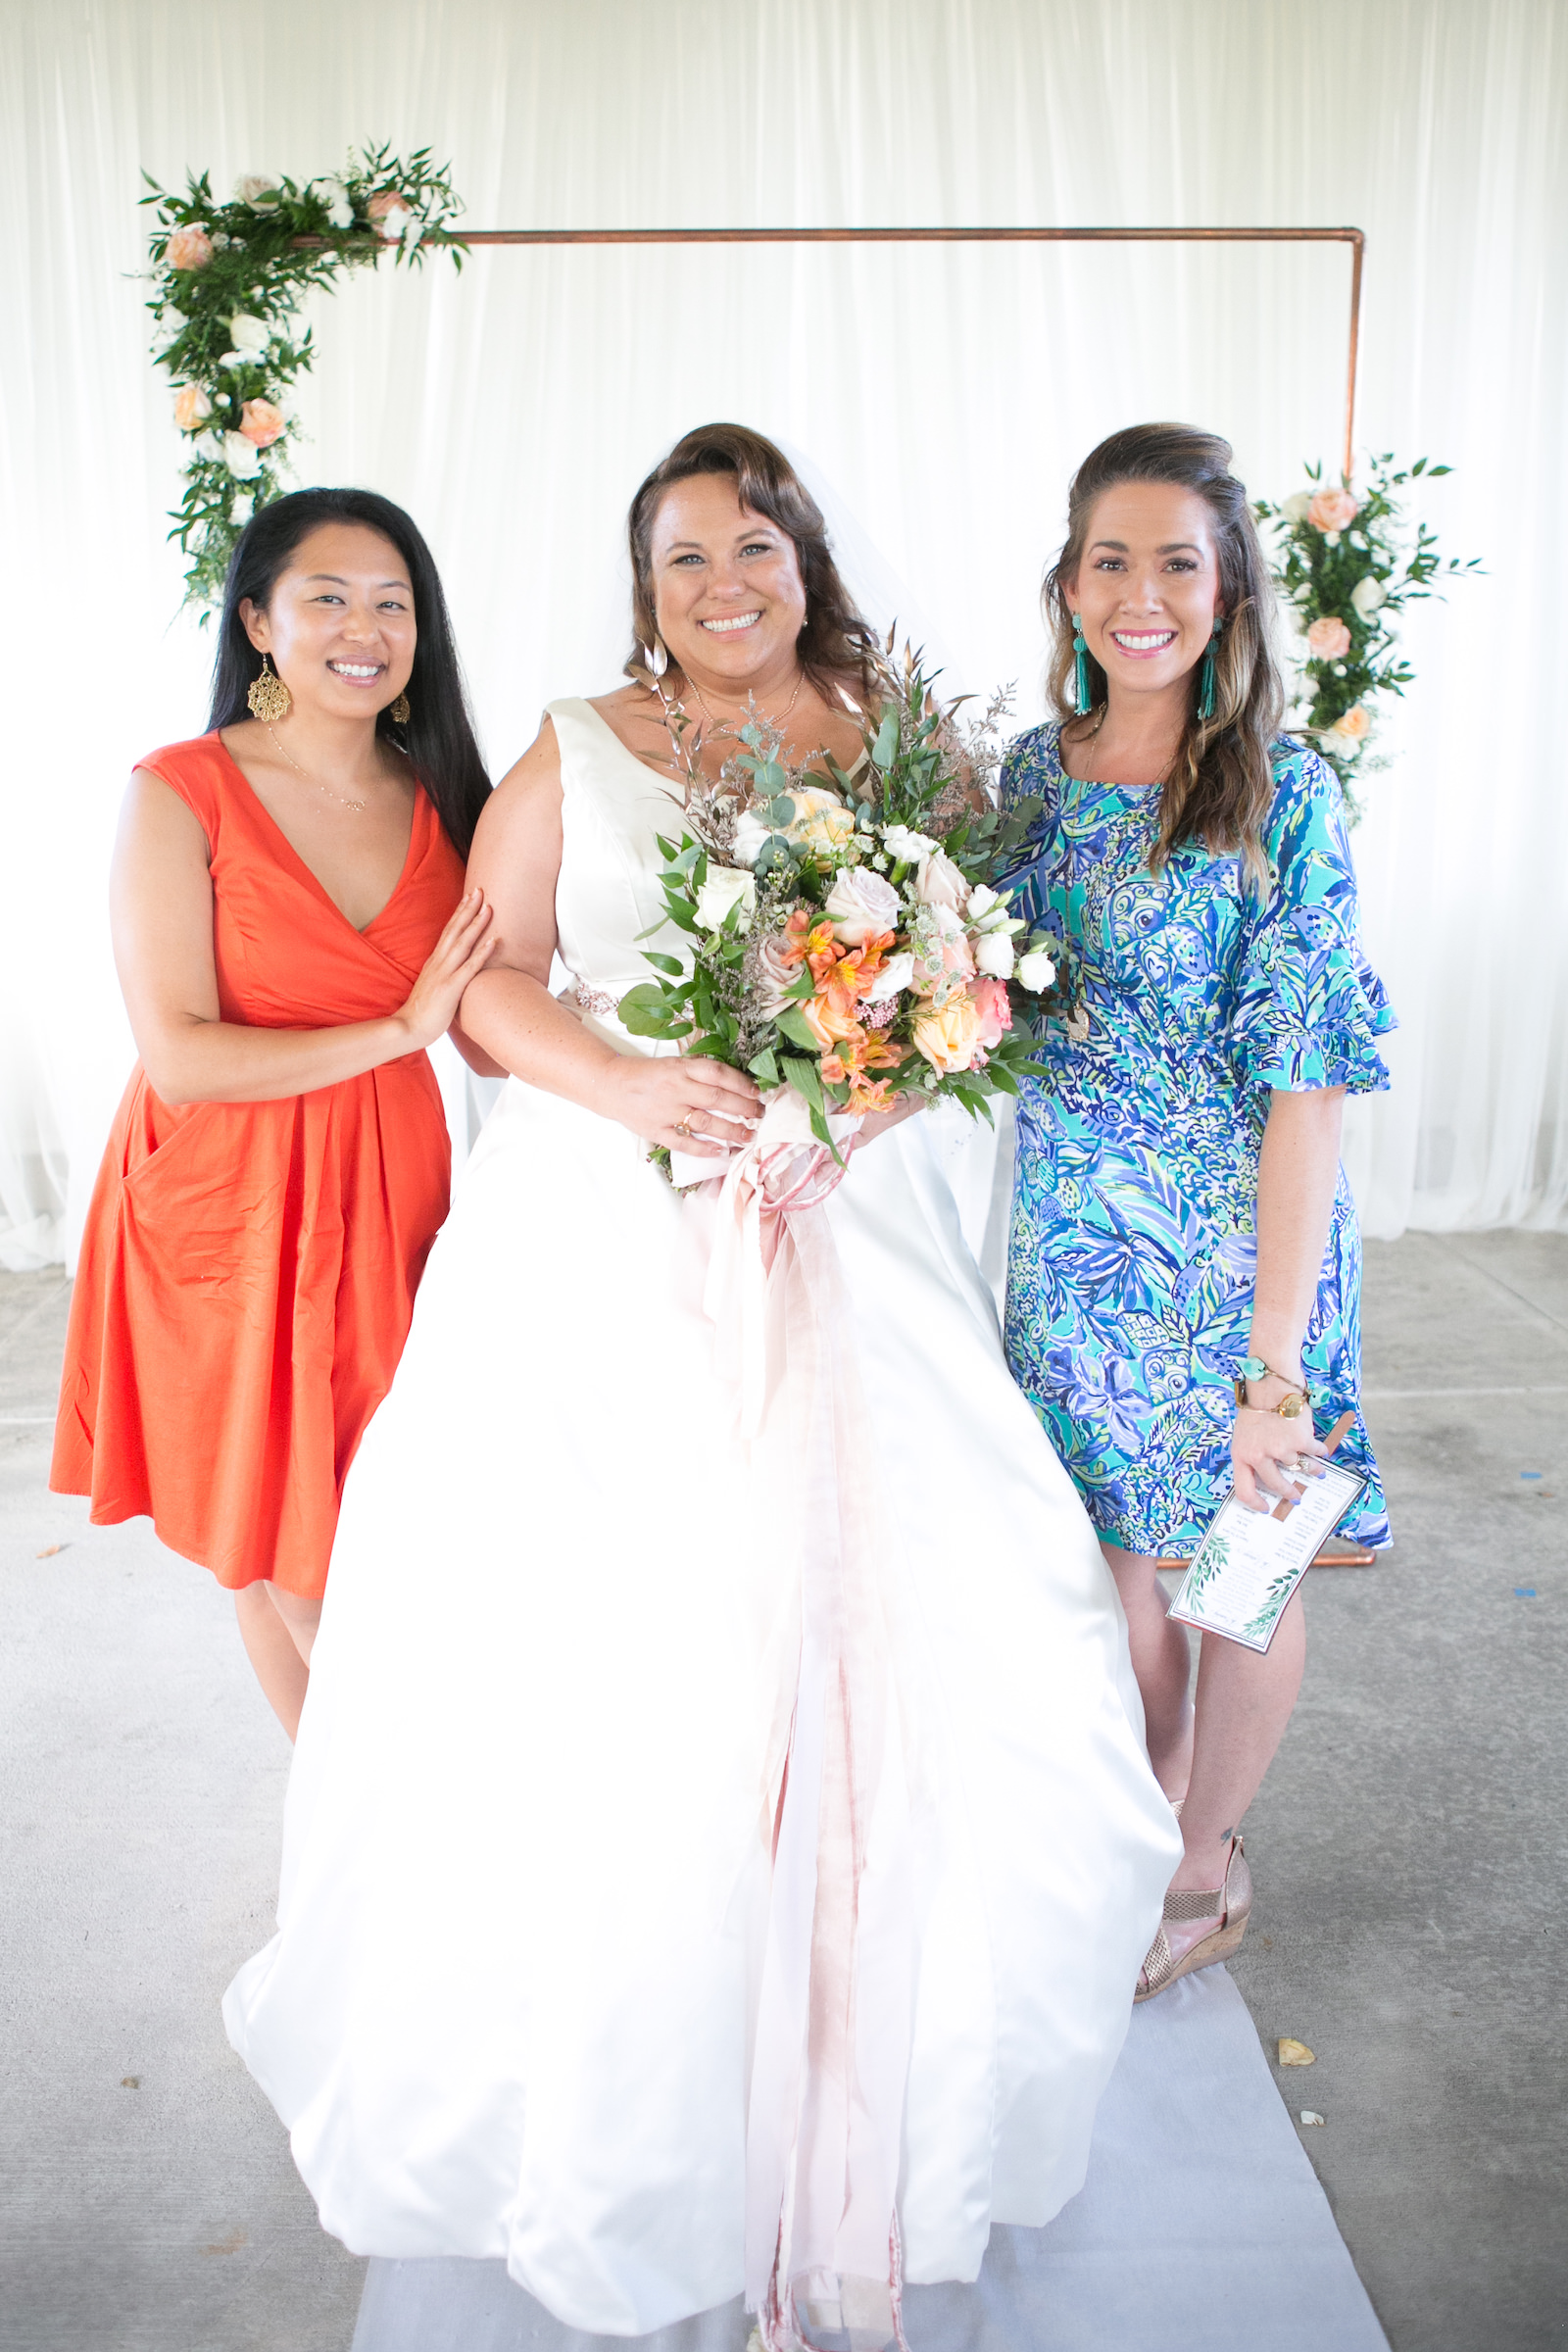 Sarah Bubar of Sarah Bubar Designs Wedding Portrait with Anna Coats and Amanda Sobel | Wedding Photographer Carrie Wildes Photography | Tampa Wedding Hair and Makeup Michele Renee the Studio | Wedding Dress Truly Forever Bridal